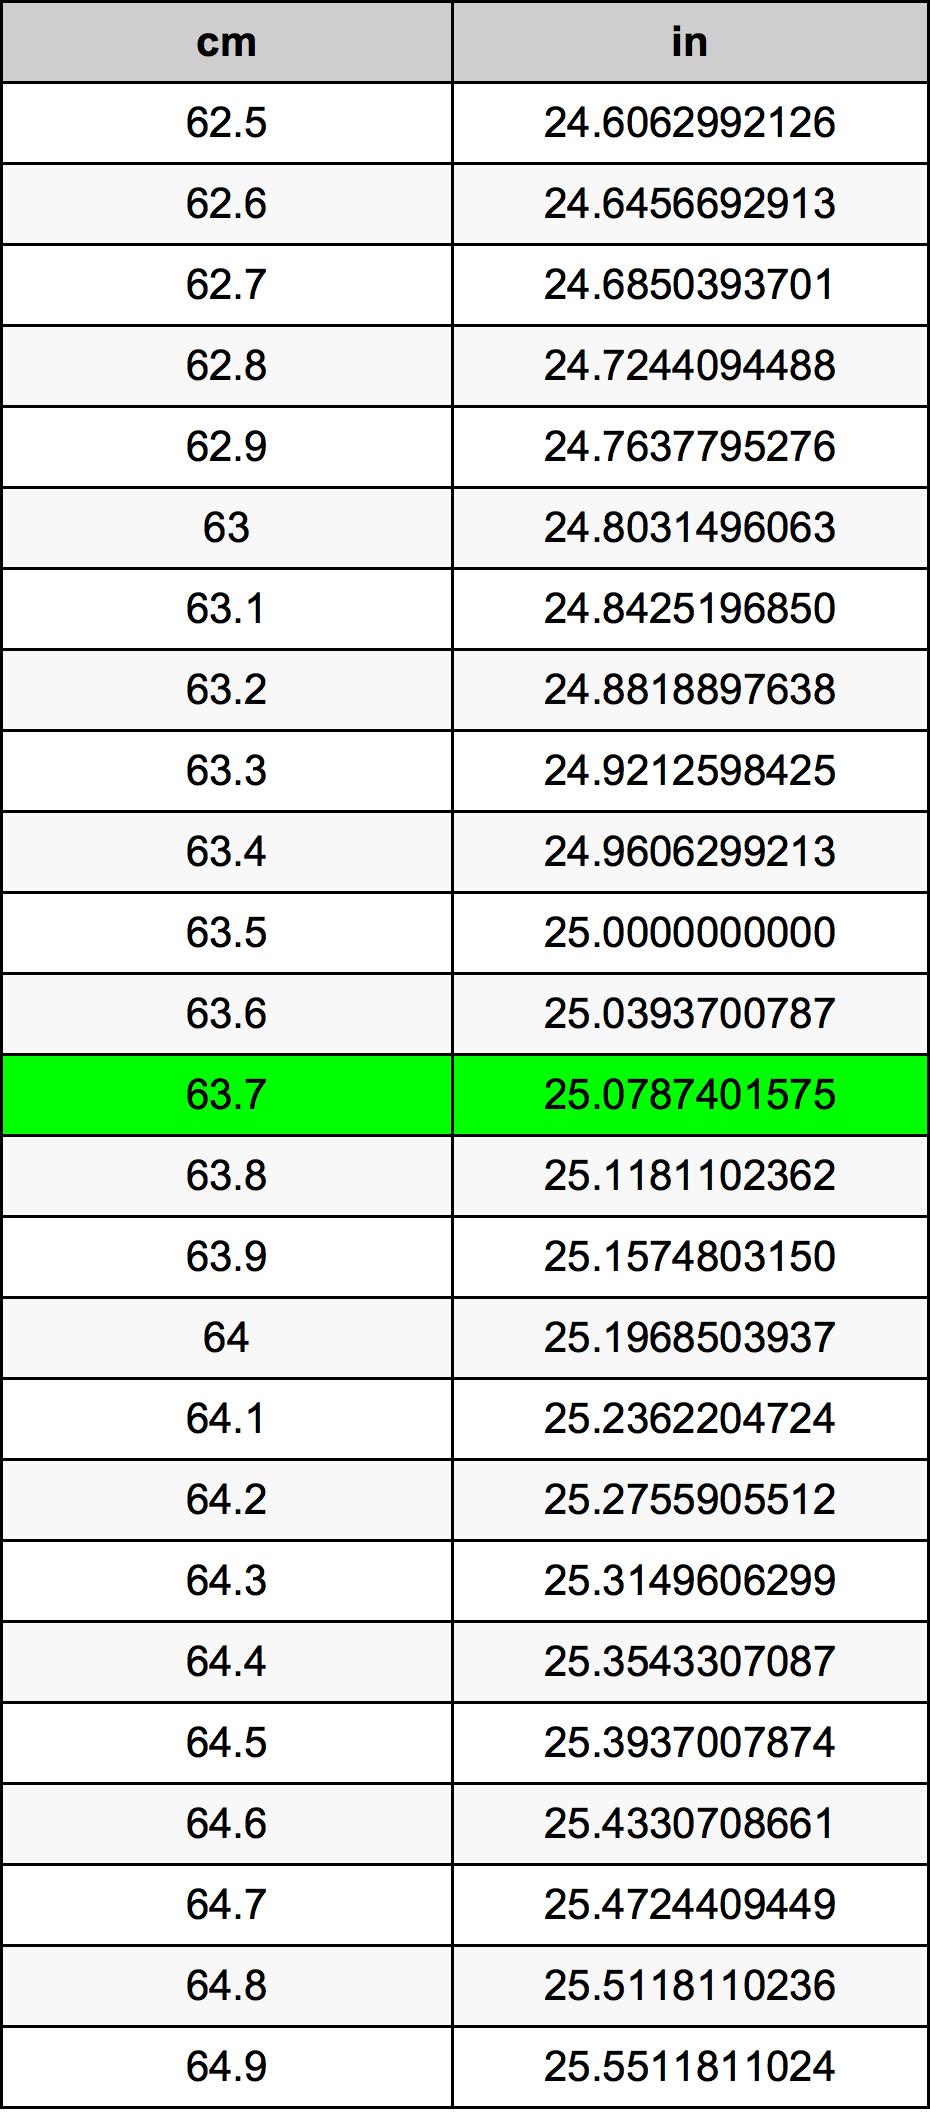 63.7 Centimeter konverteringstabellen